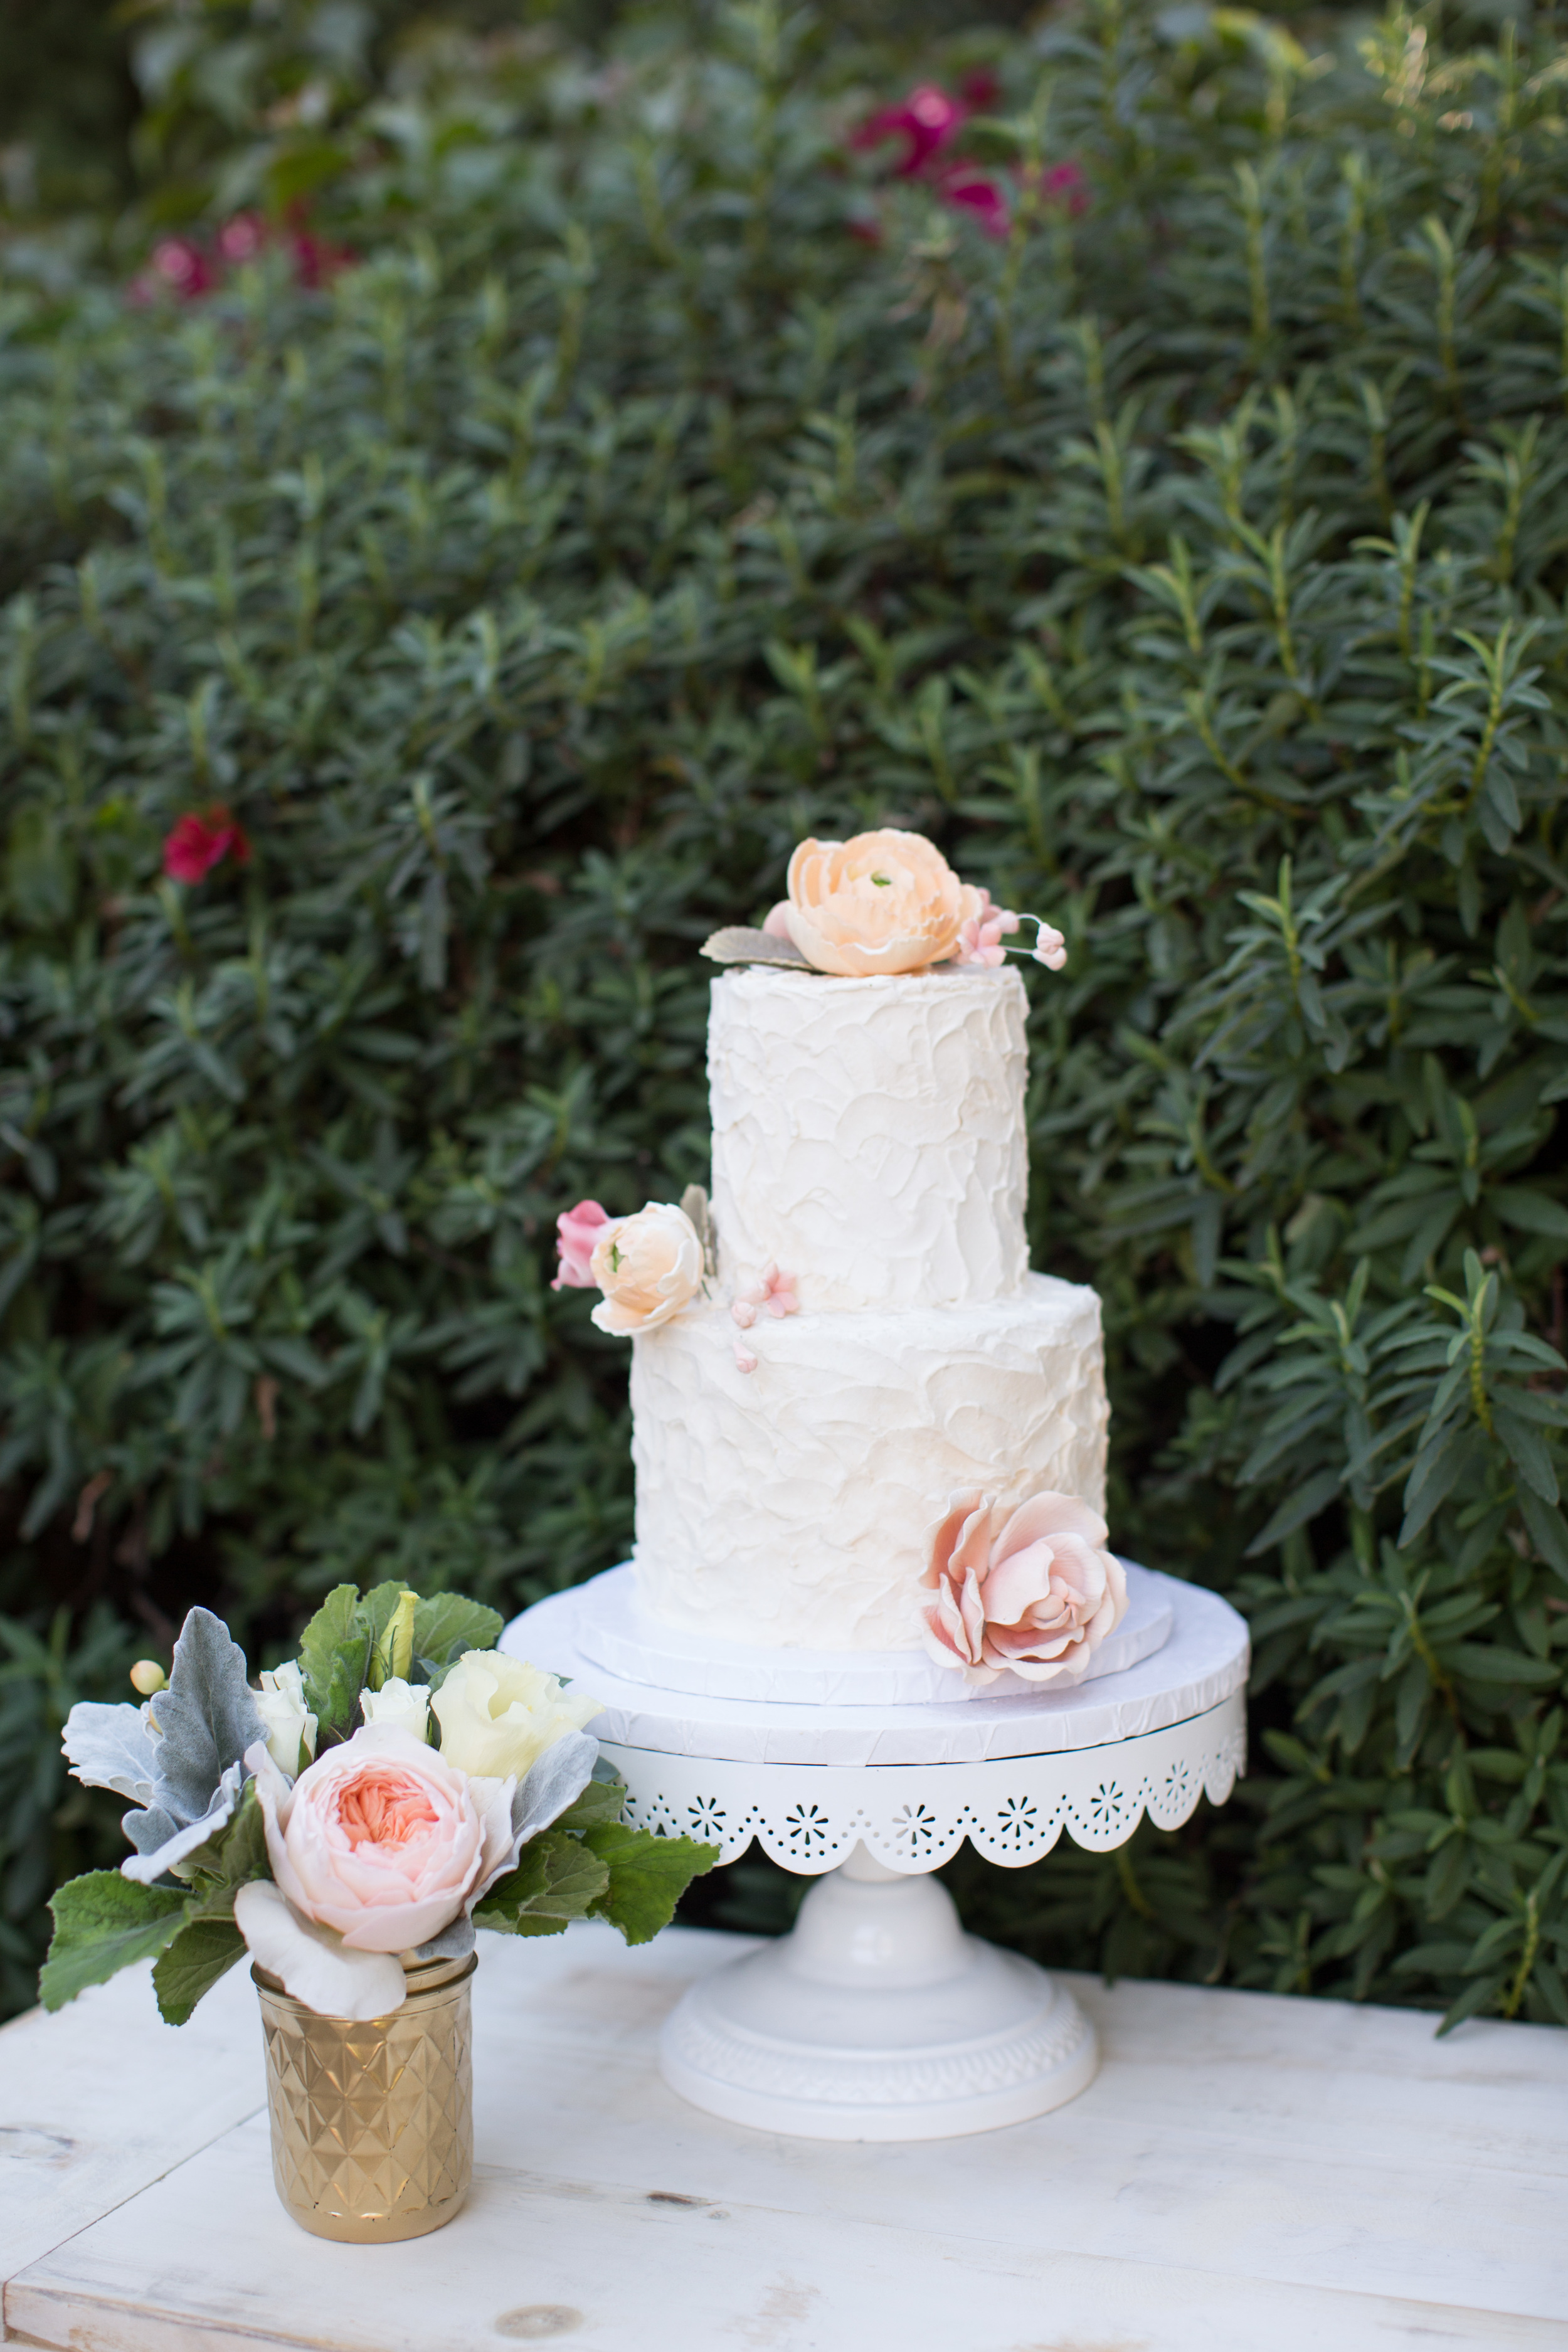 David Manning Photography and Morgan Leigh Boberg wedding cake The Estancia